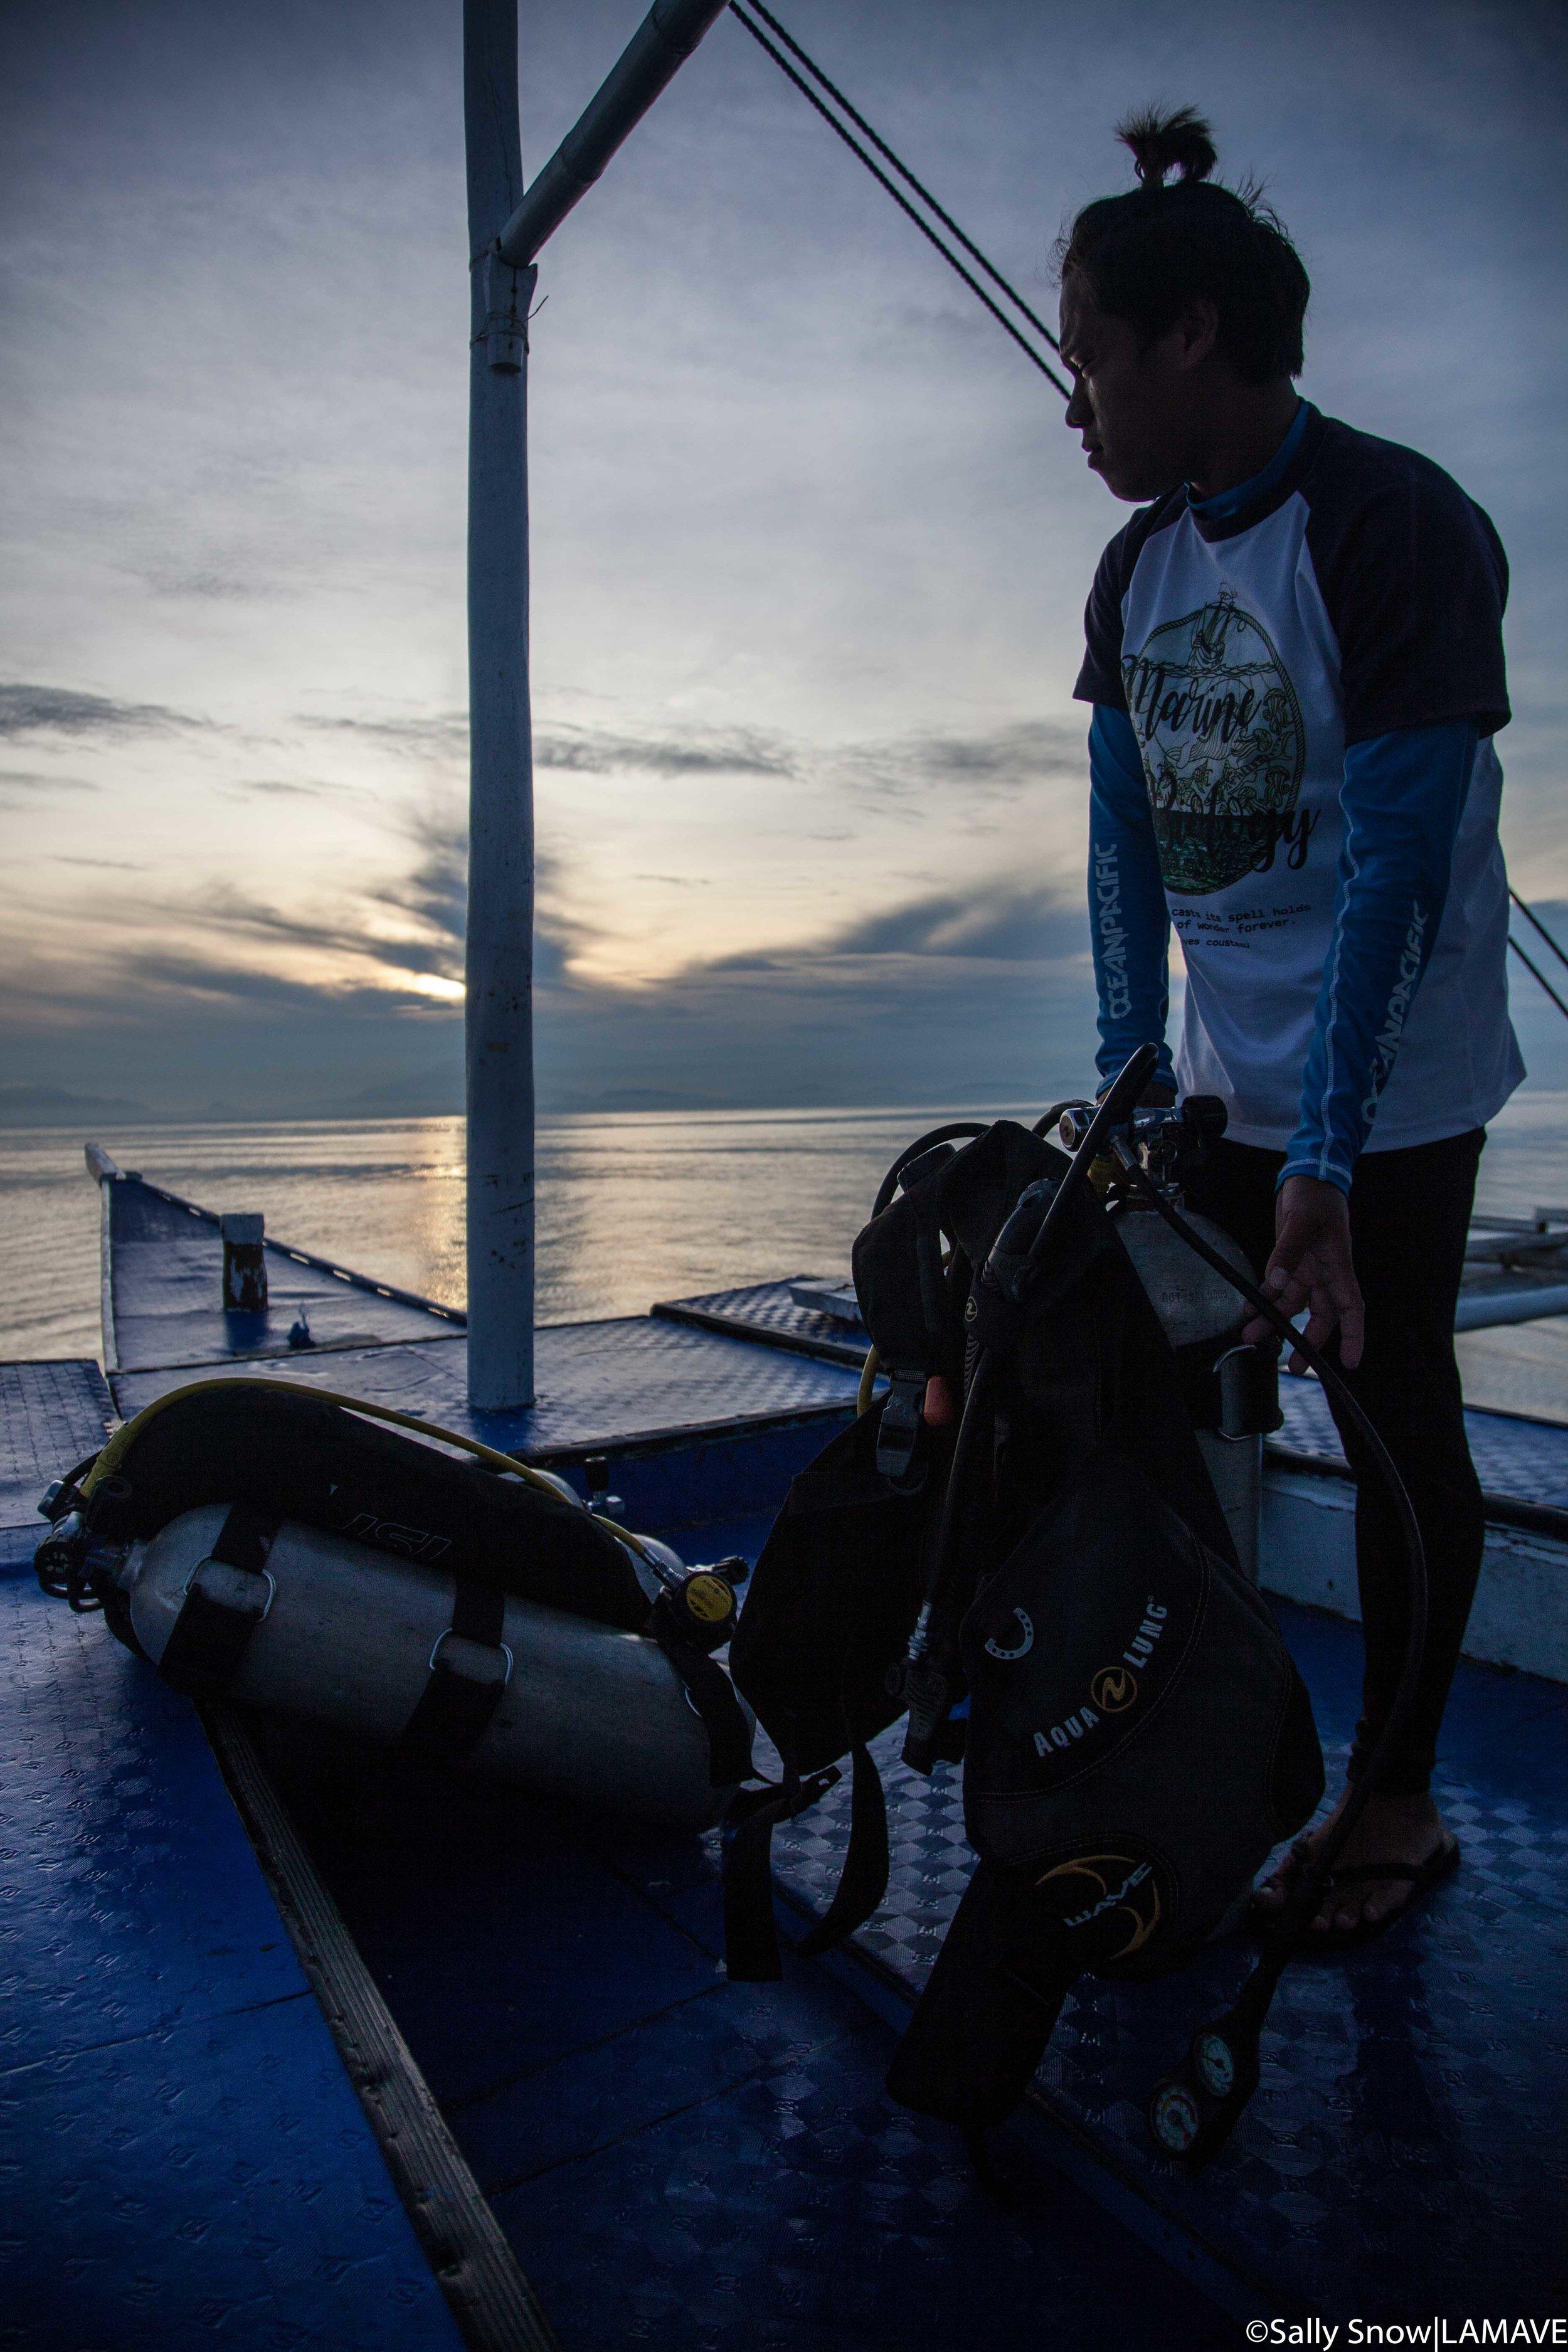 Jemar prepares his scuba gear as the sun rises over the volcanic horizon of the Bicol Region.